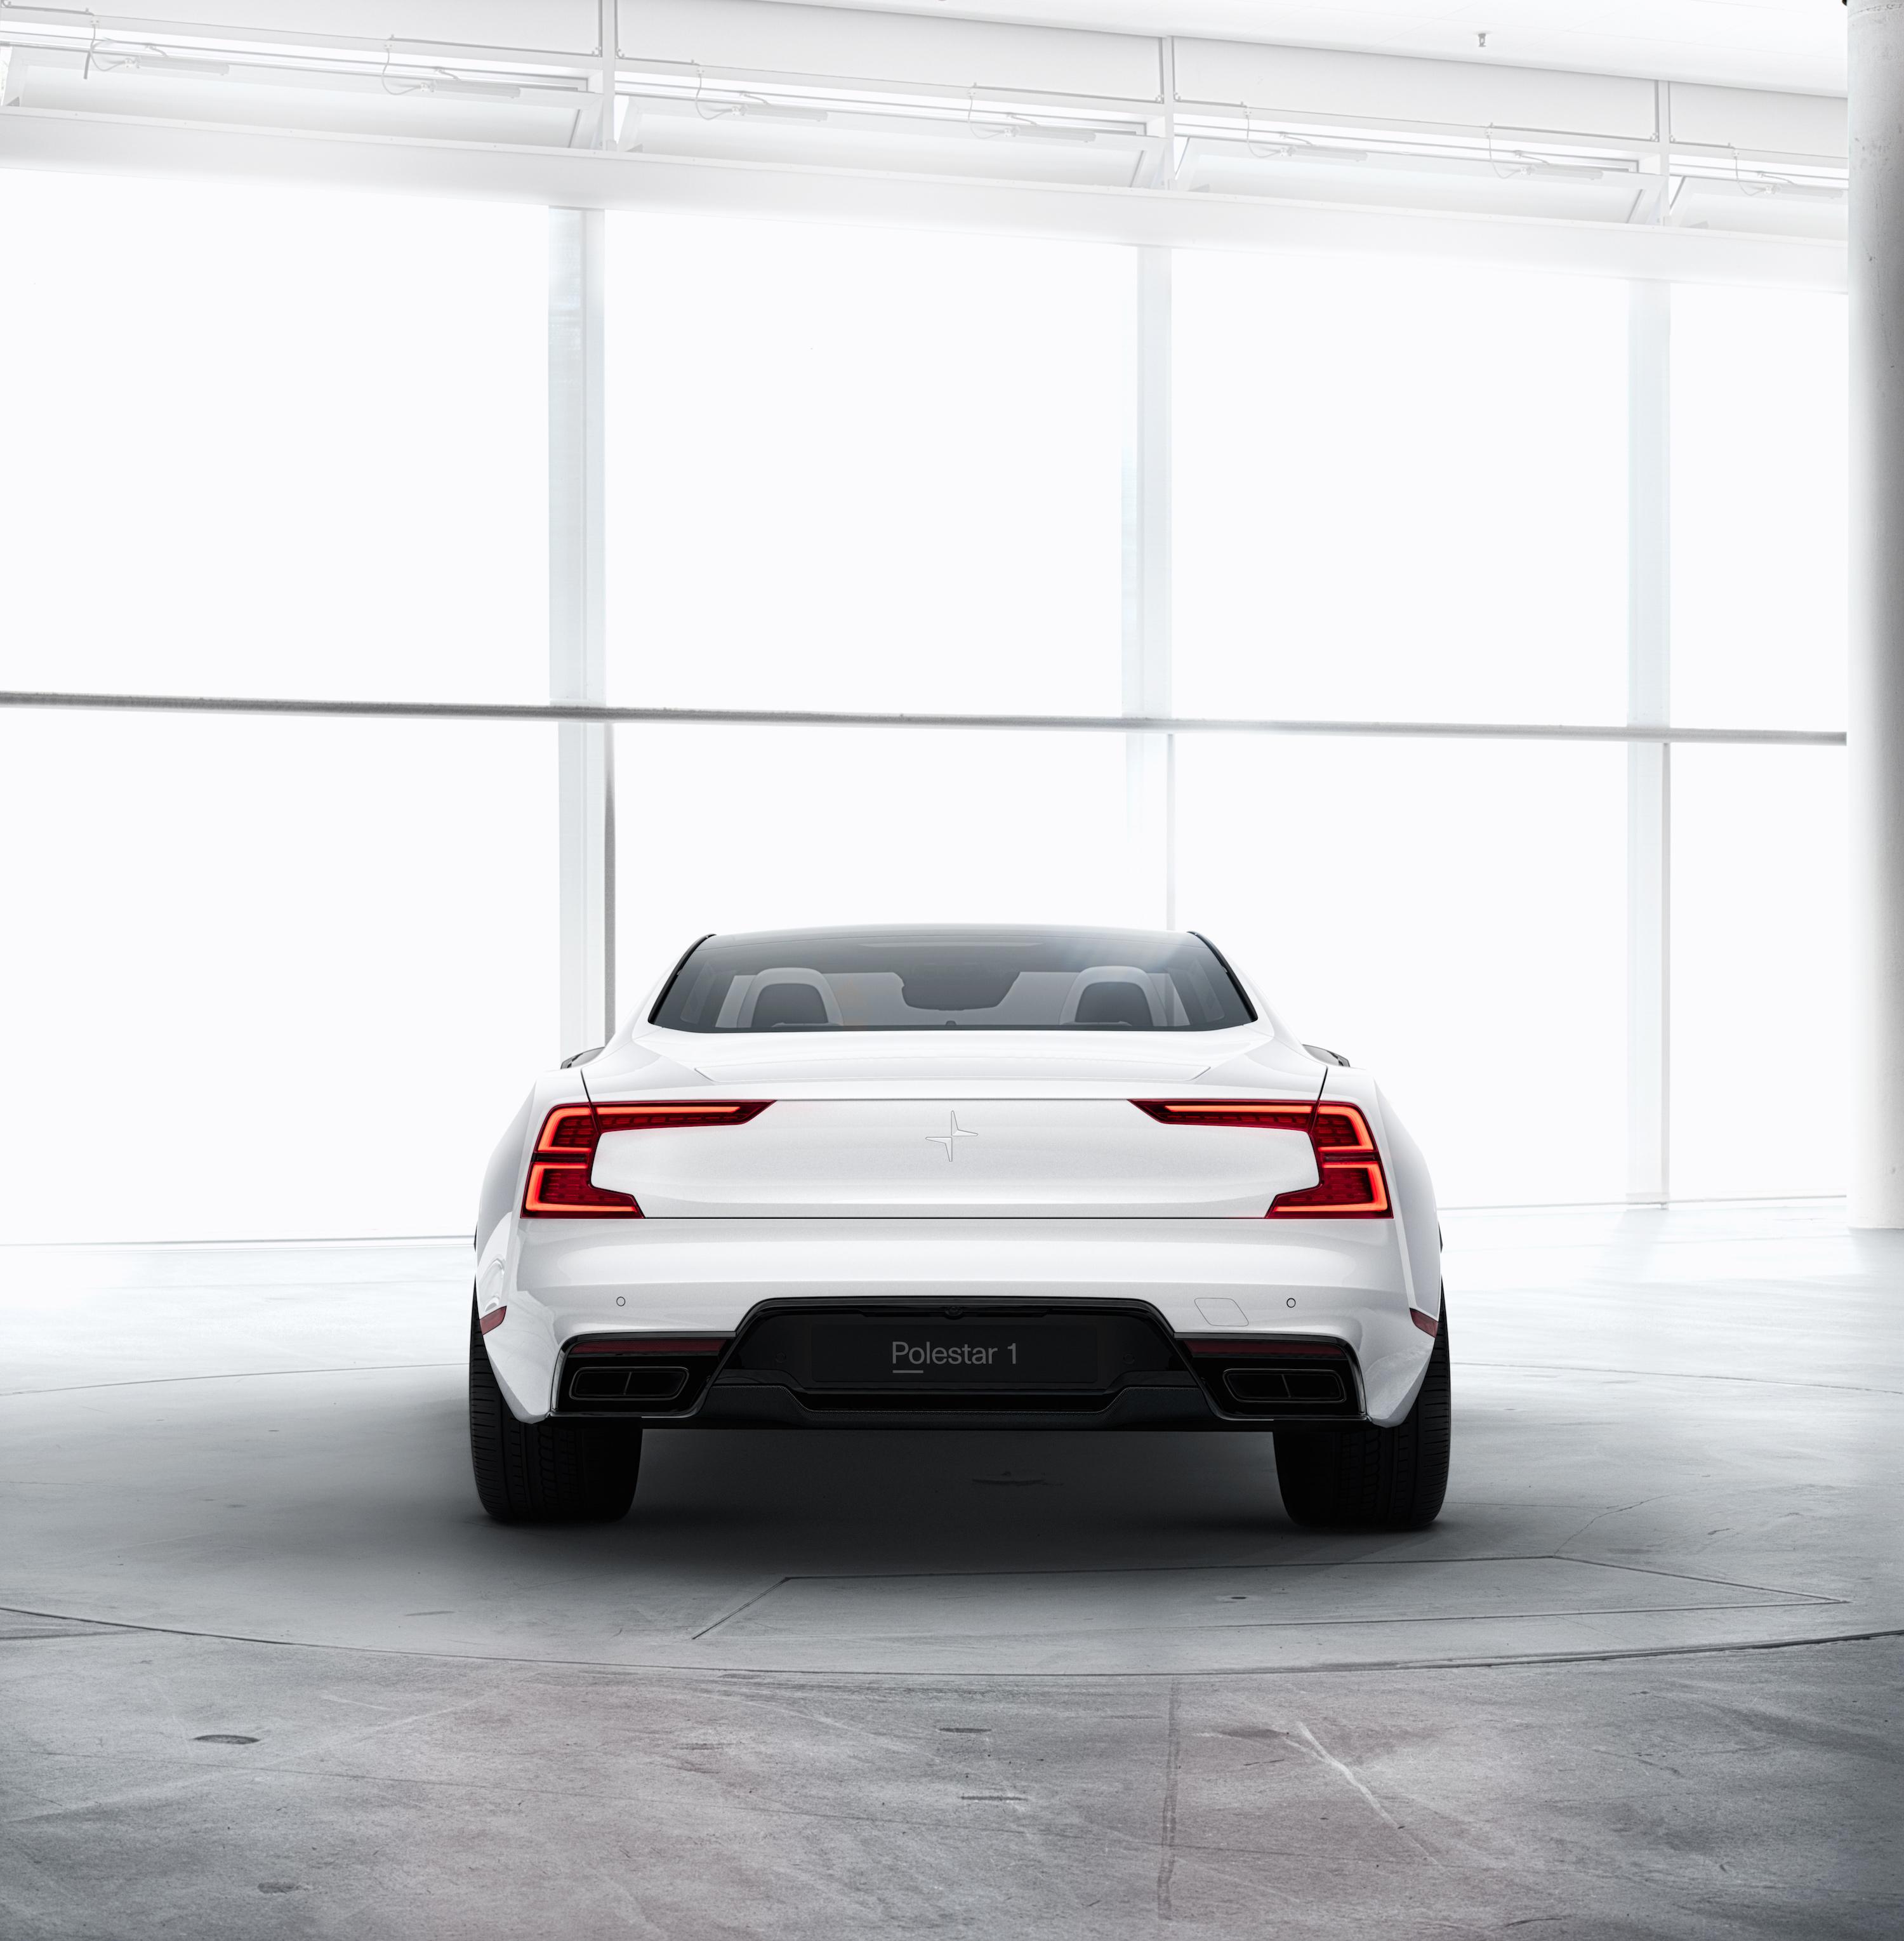 Polestar Reveals New Polestar 2: The Polestar 1 Is A 600-horsepower Hybrid Sports Coupe